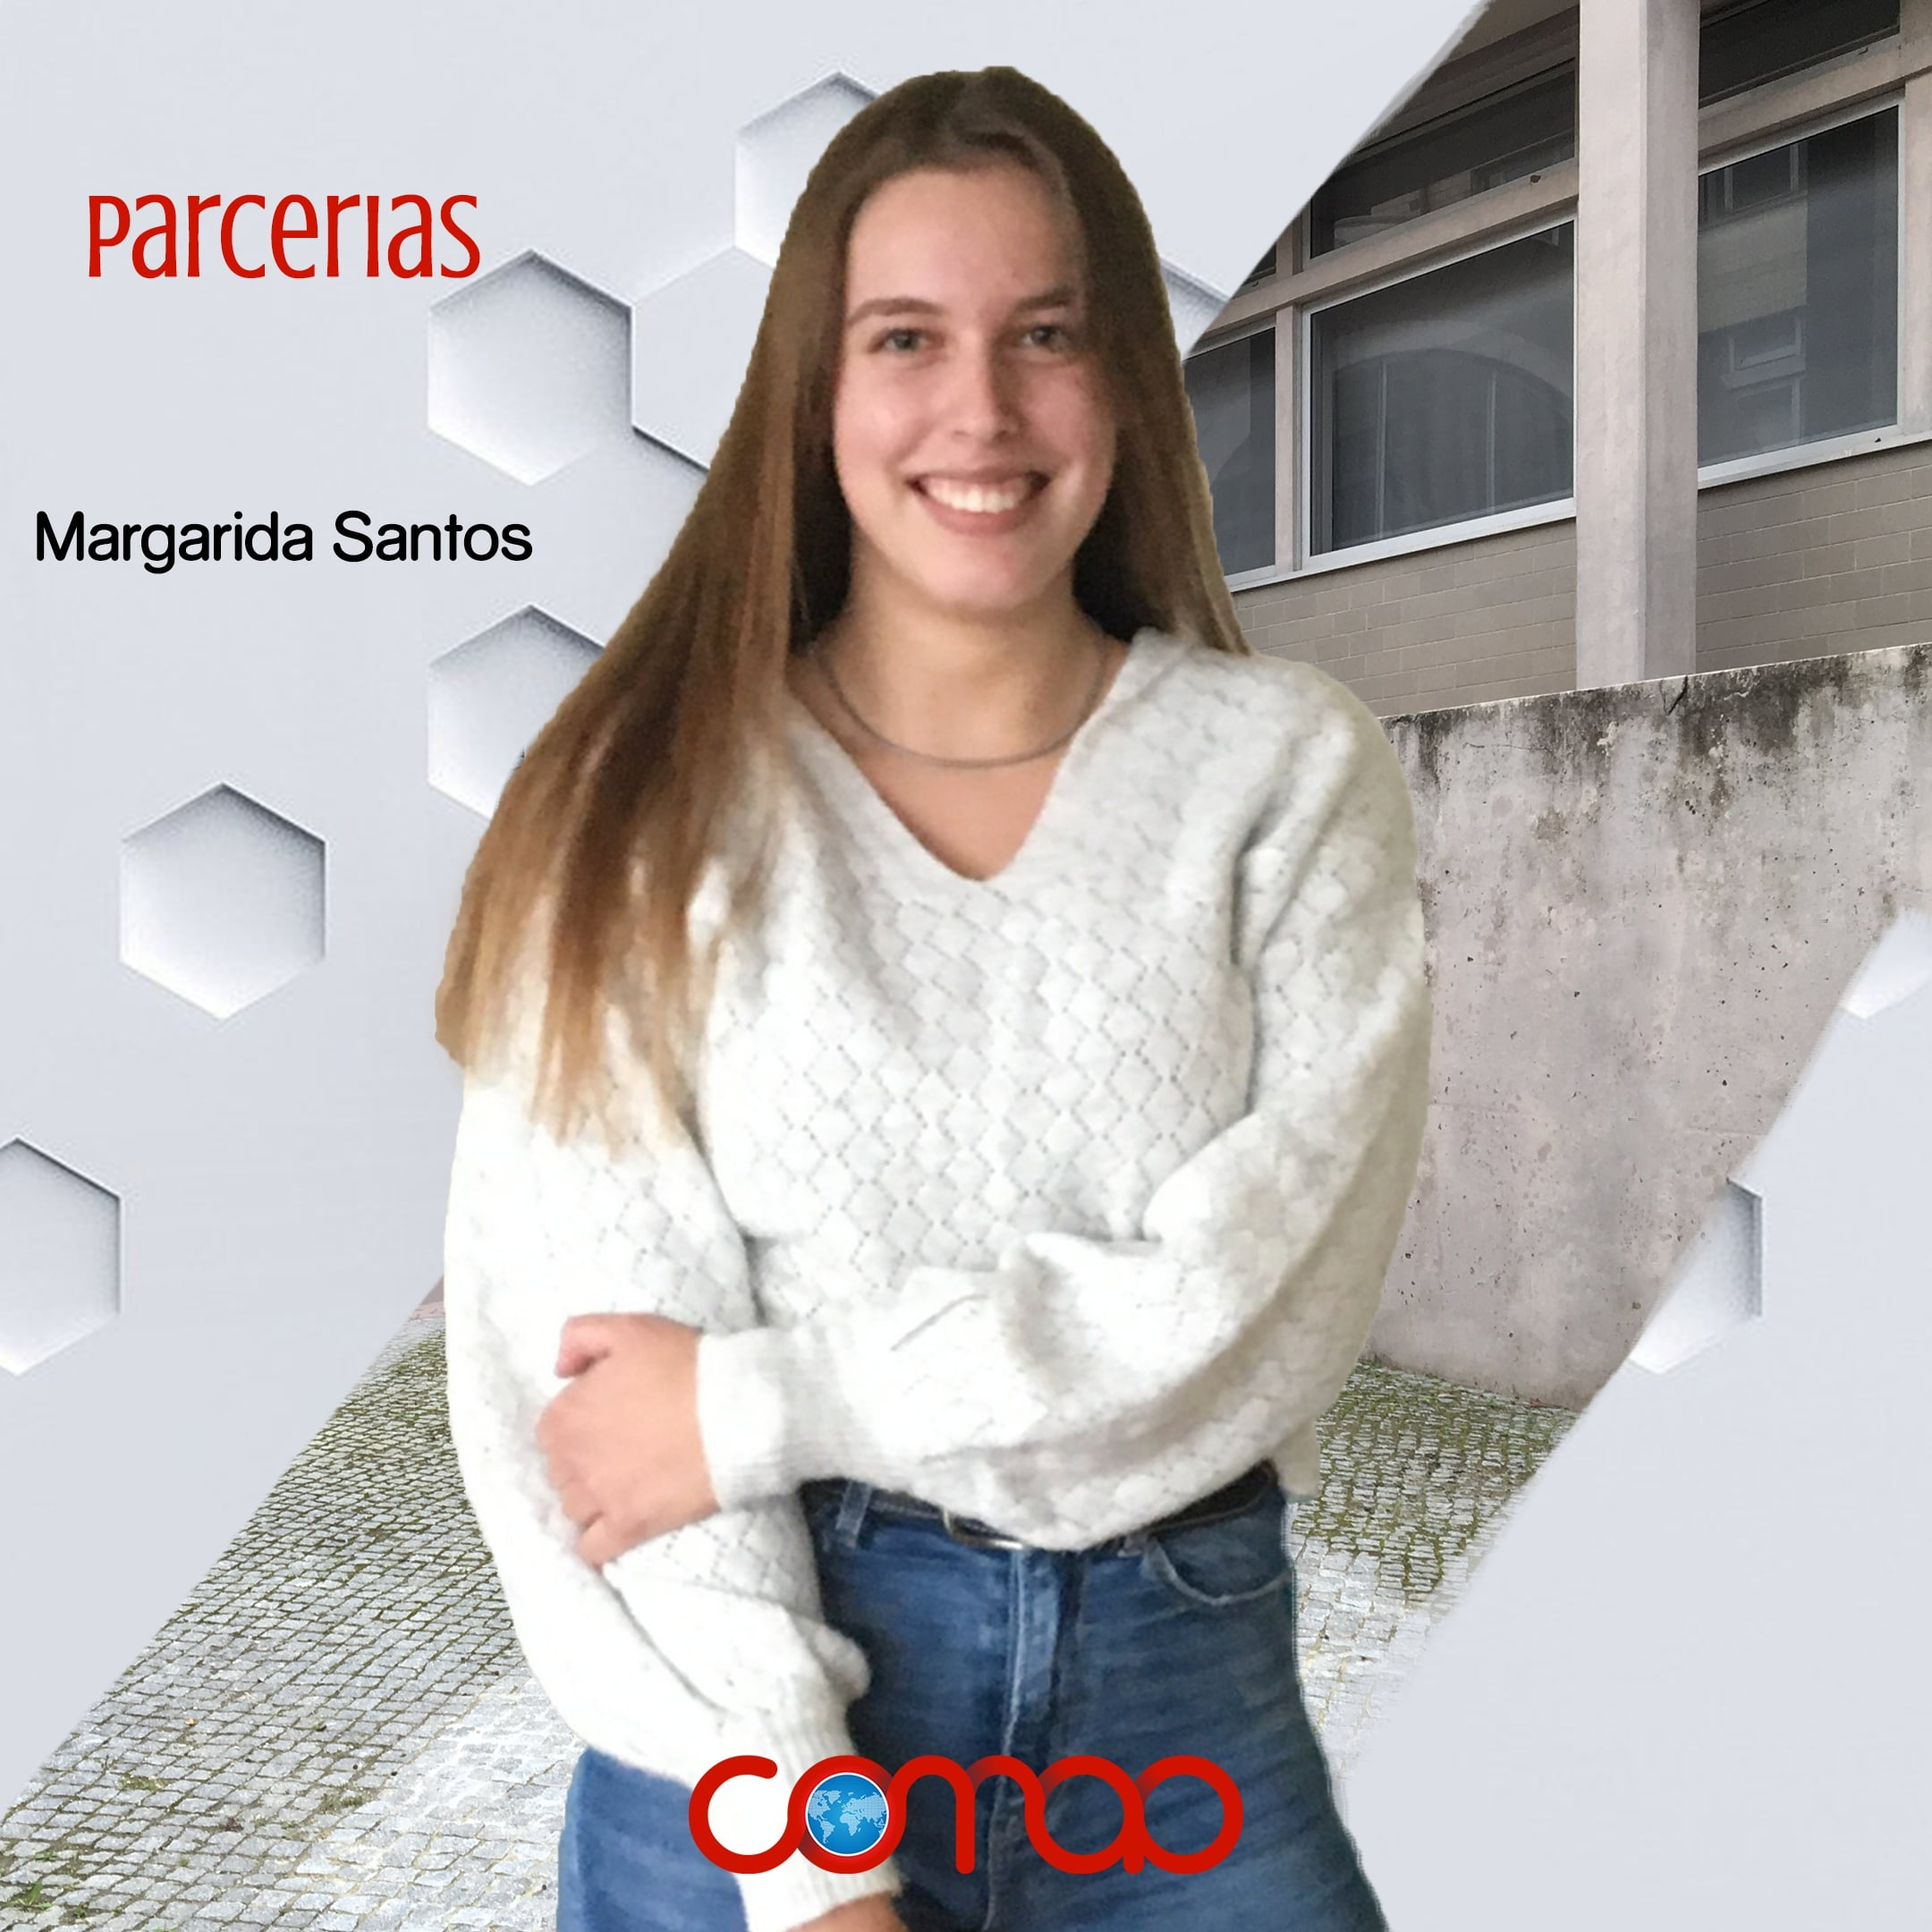 Margarida Sabntos